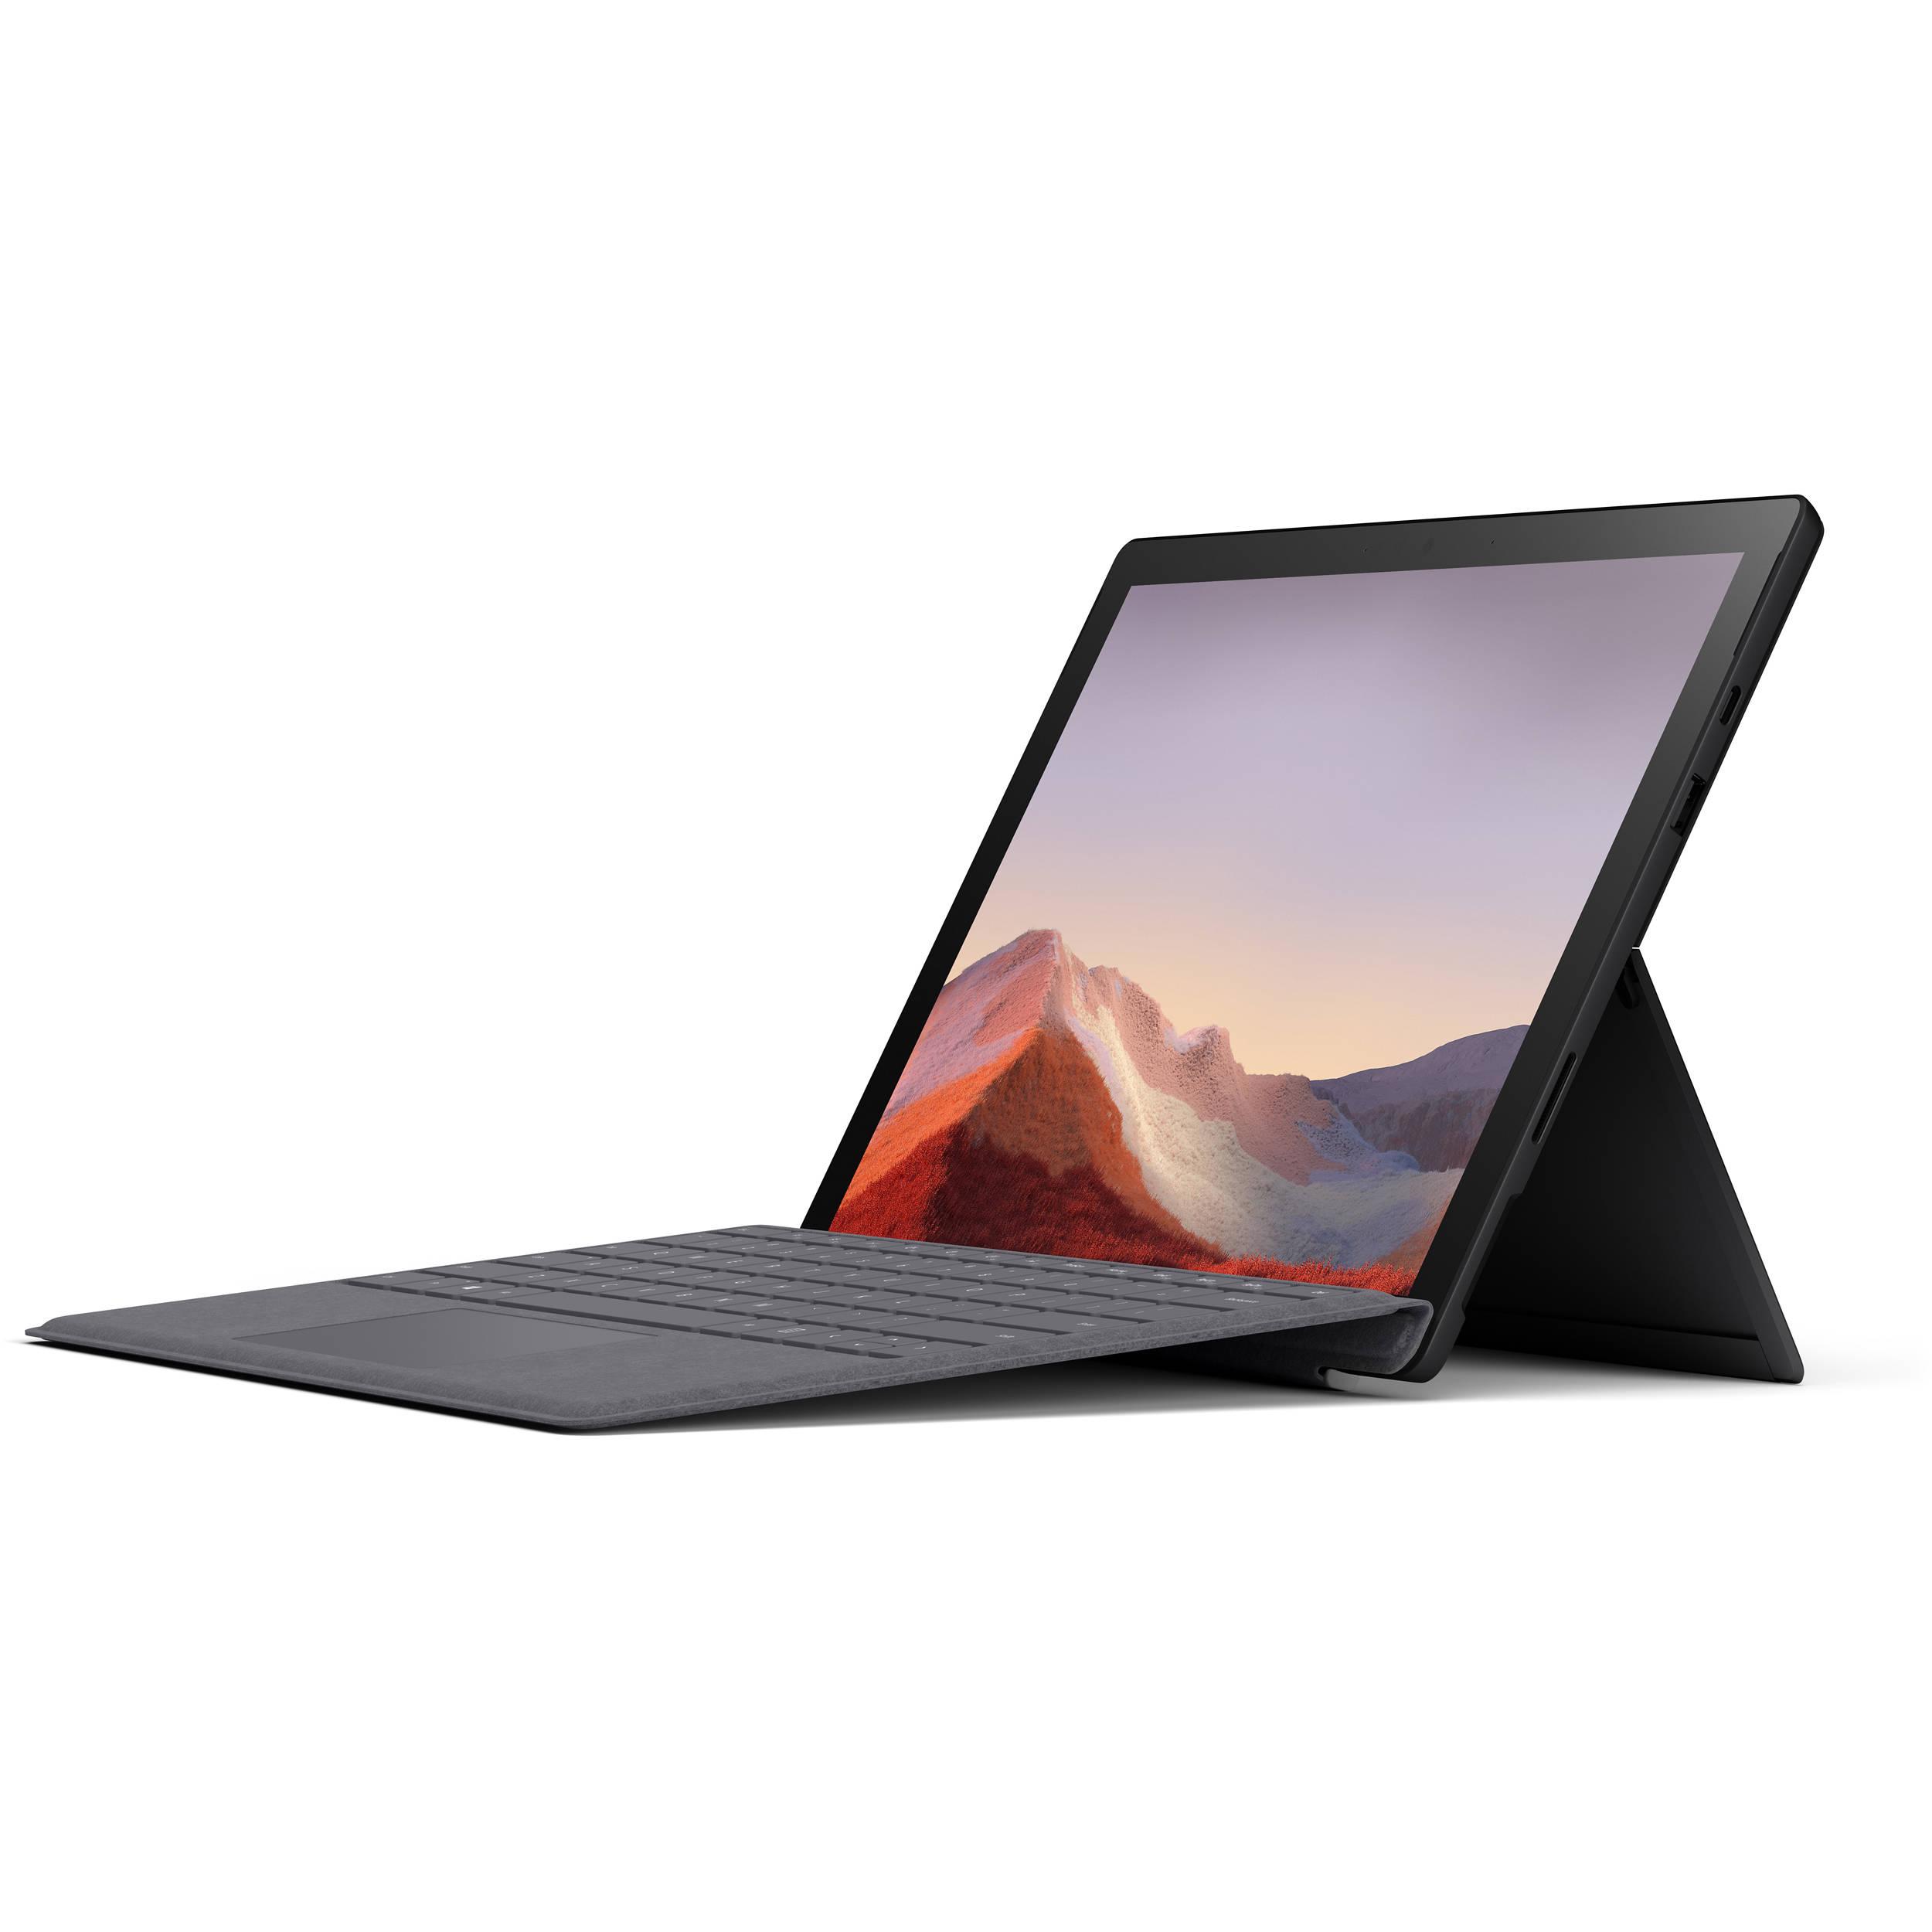 Surfaceライクな2in1パソコンまとめ。(201912)